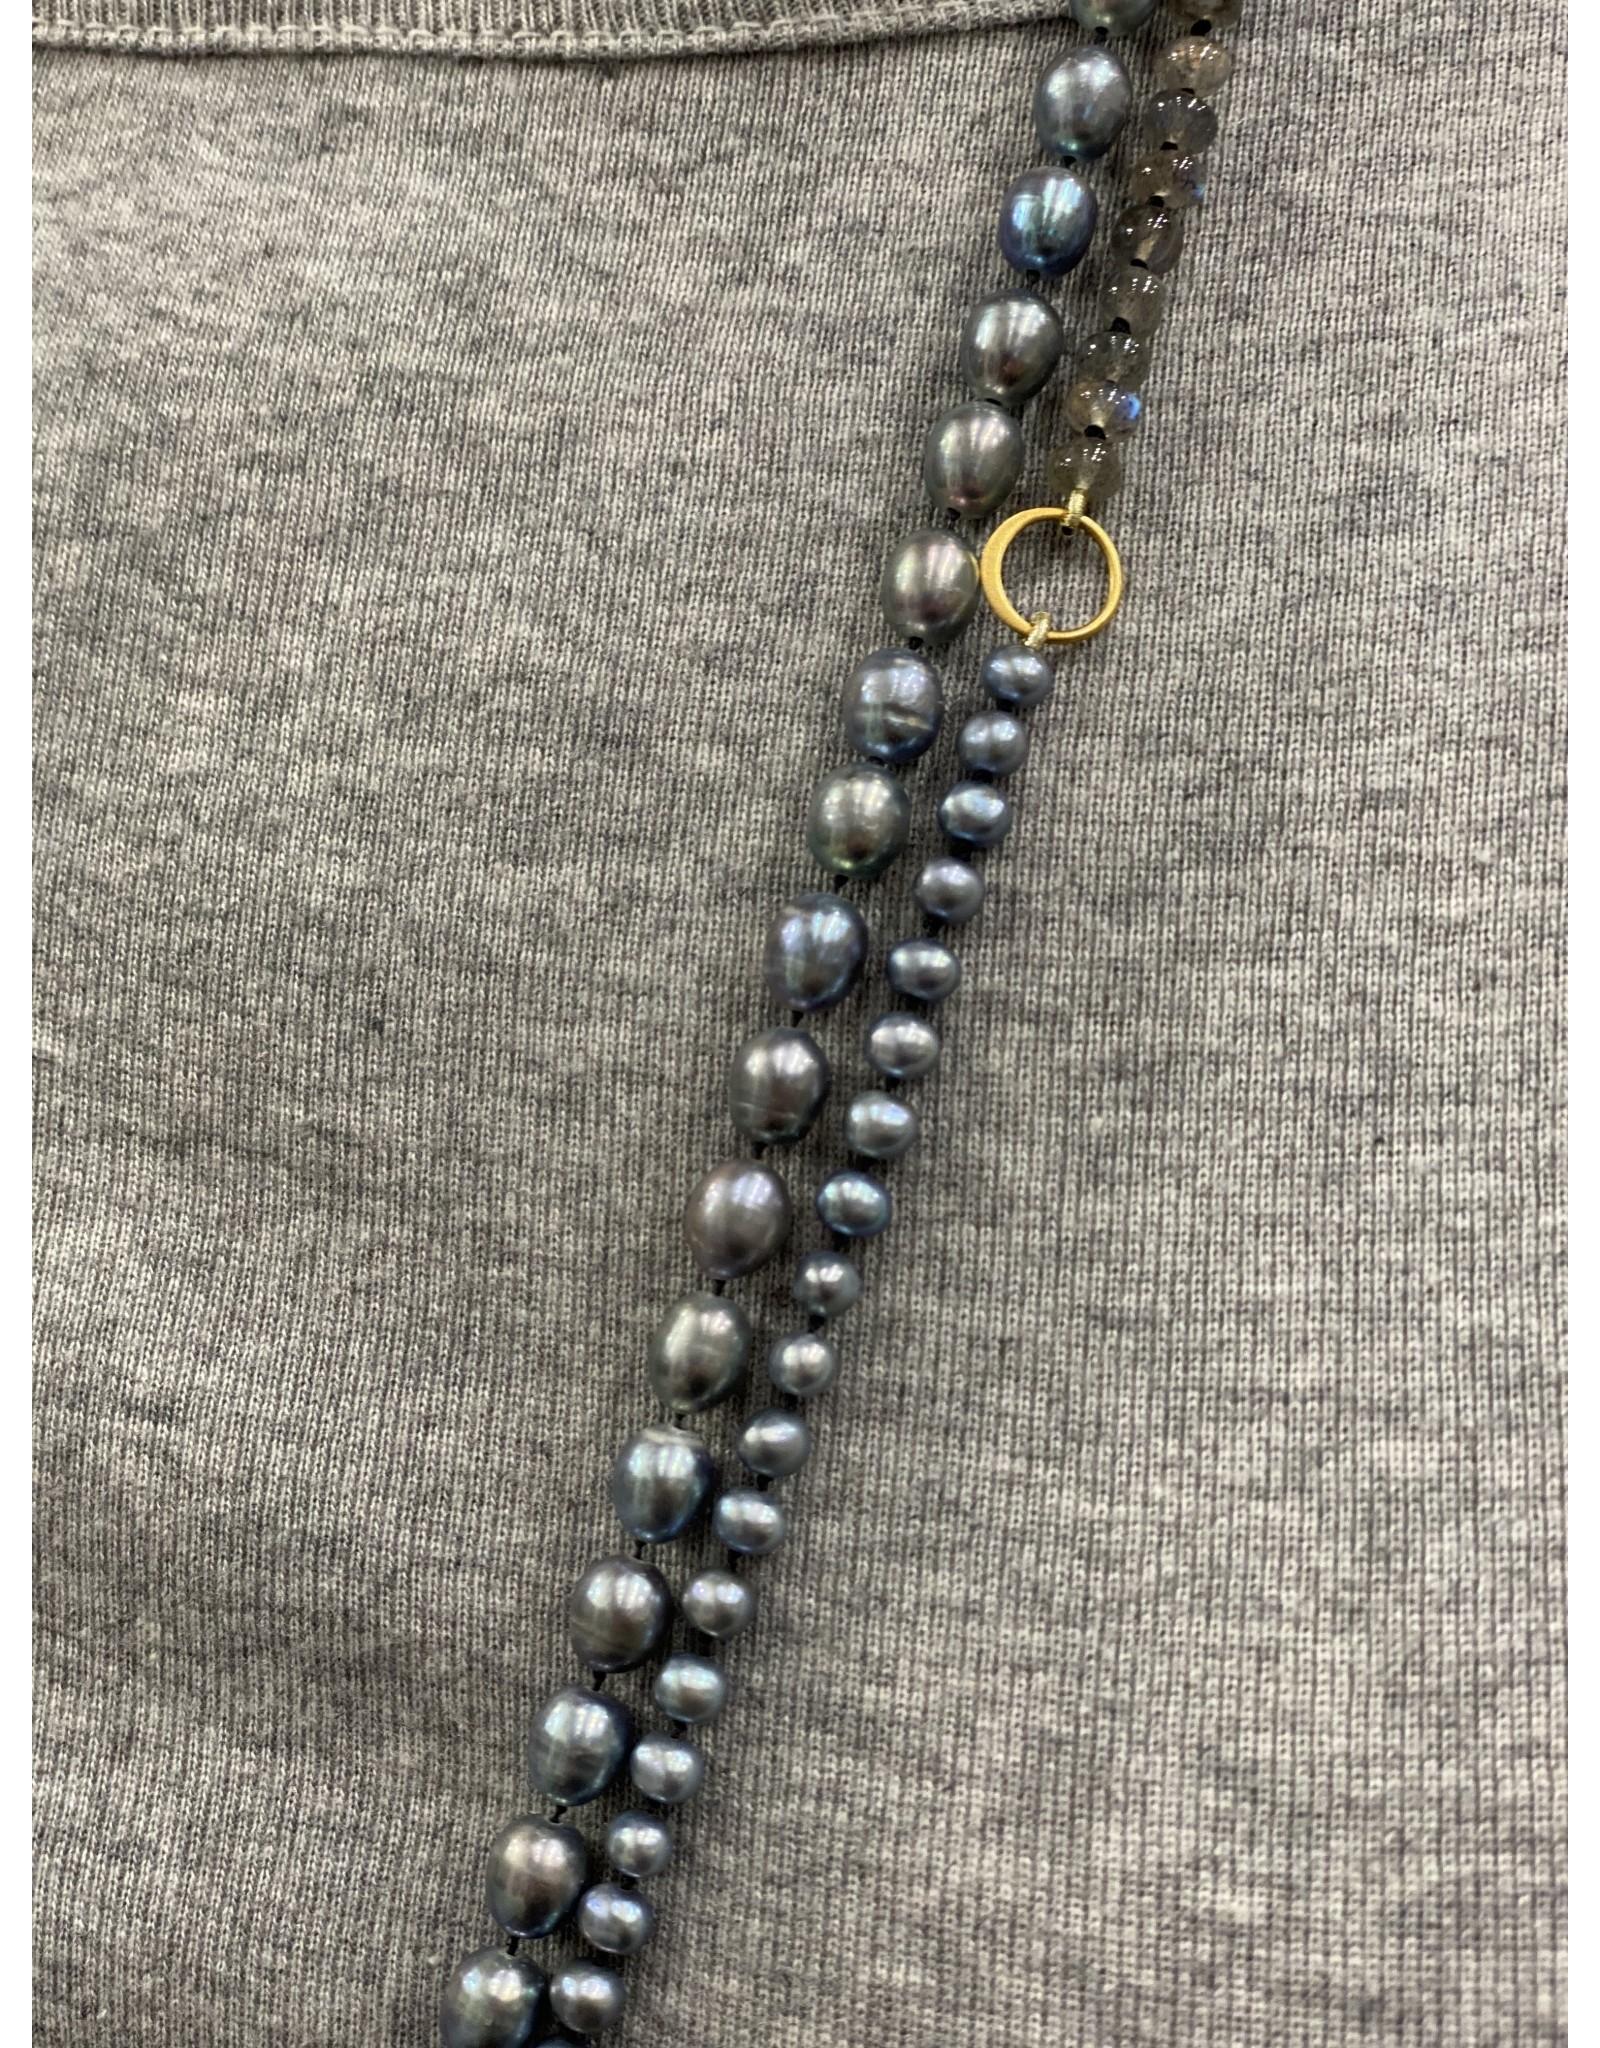 Moondance Alaska by Colleen Goldrich Moondance Necklace Mixed Pearls, Labradorite, 14K Gold Fill